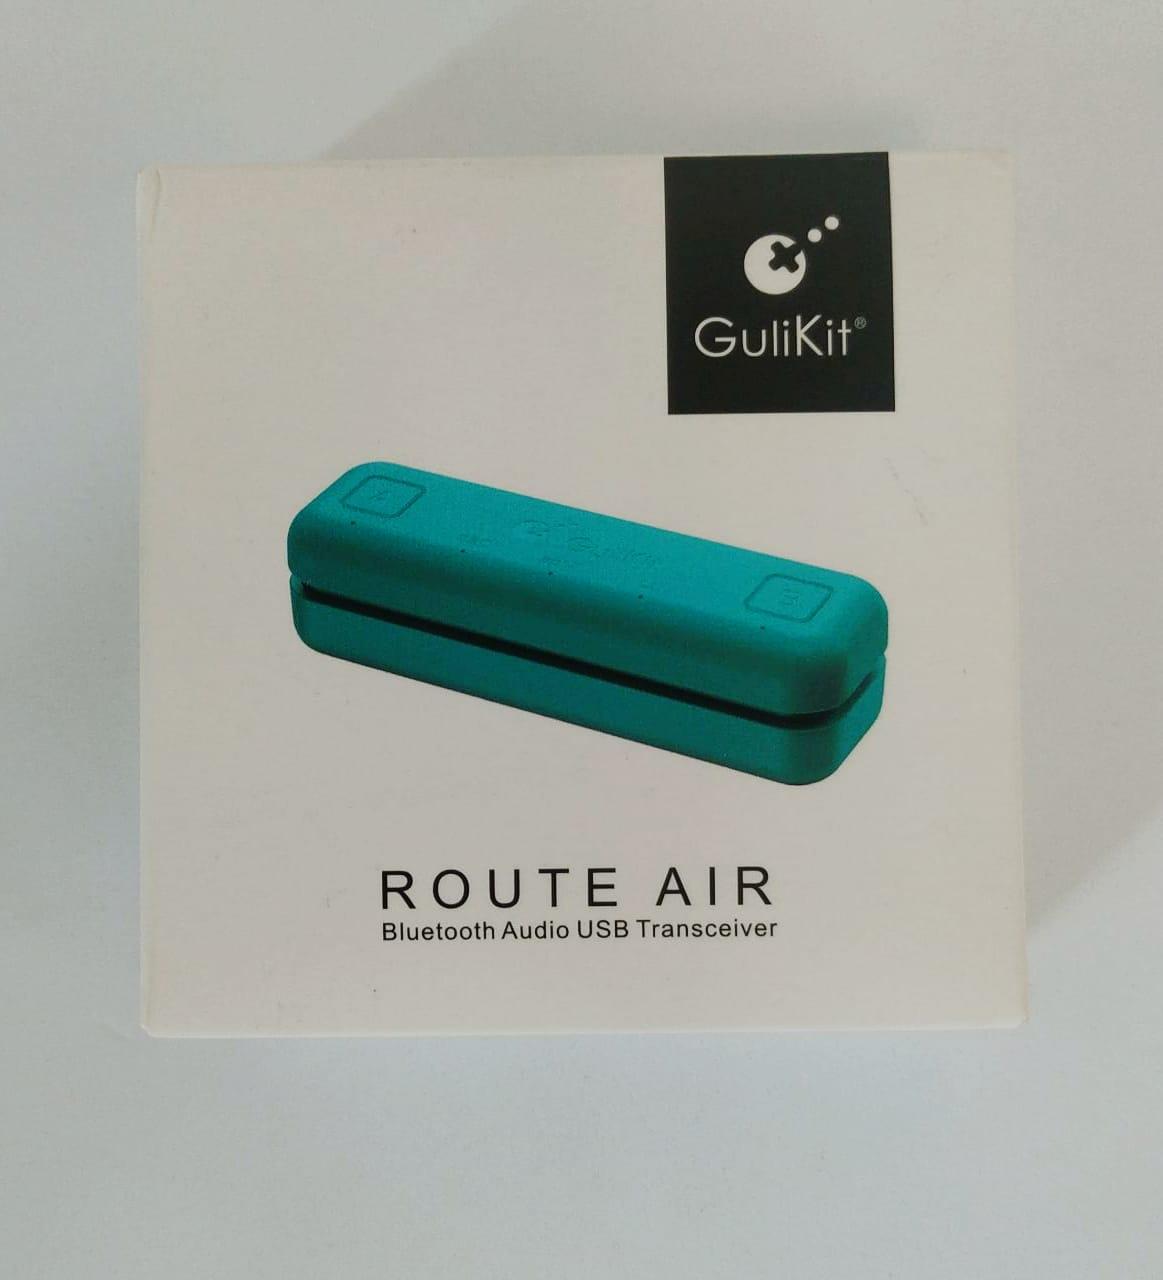 Adaptador Bluethoot GuliKit Route Air  - Nintendo Switch - Usado